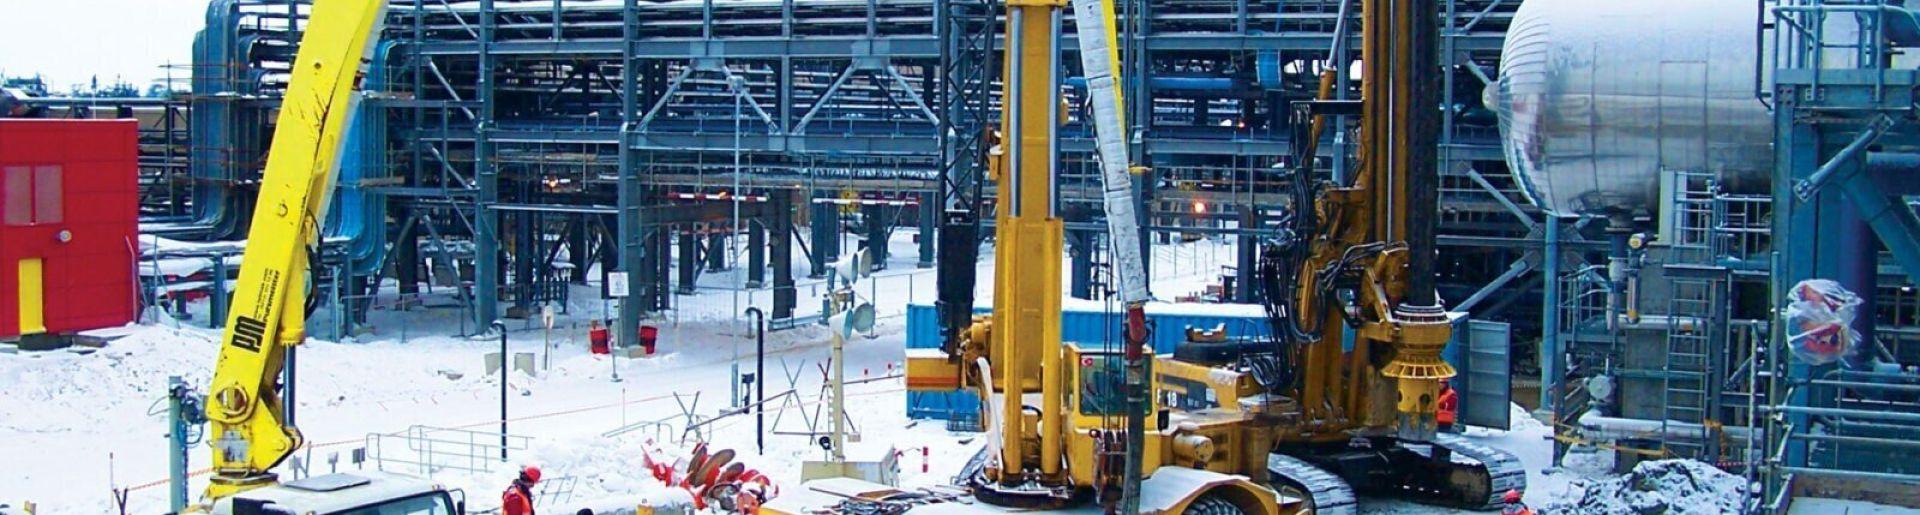 On-Shore Processing Facility, Sakhalin Island